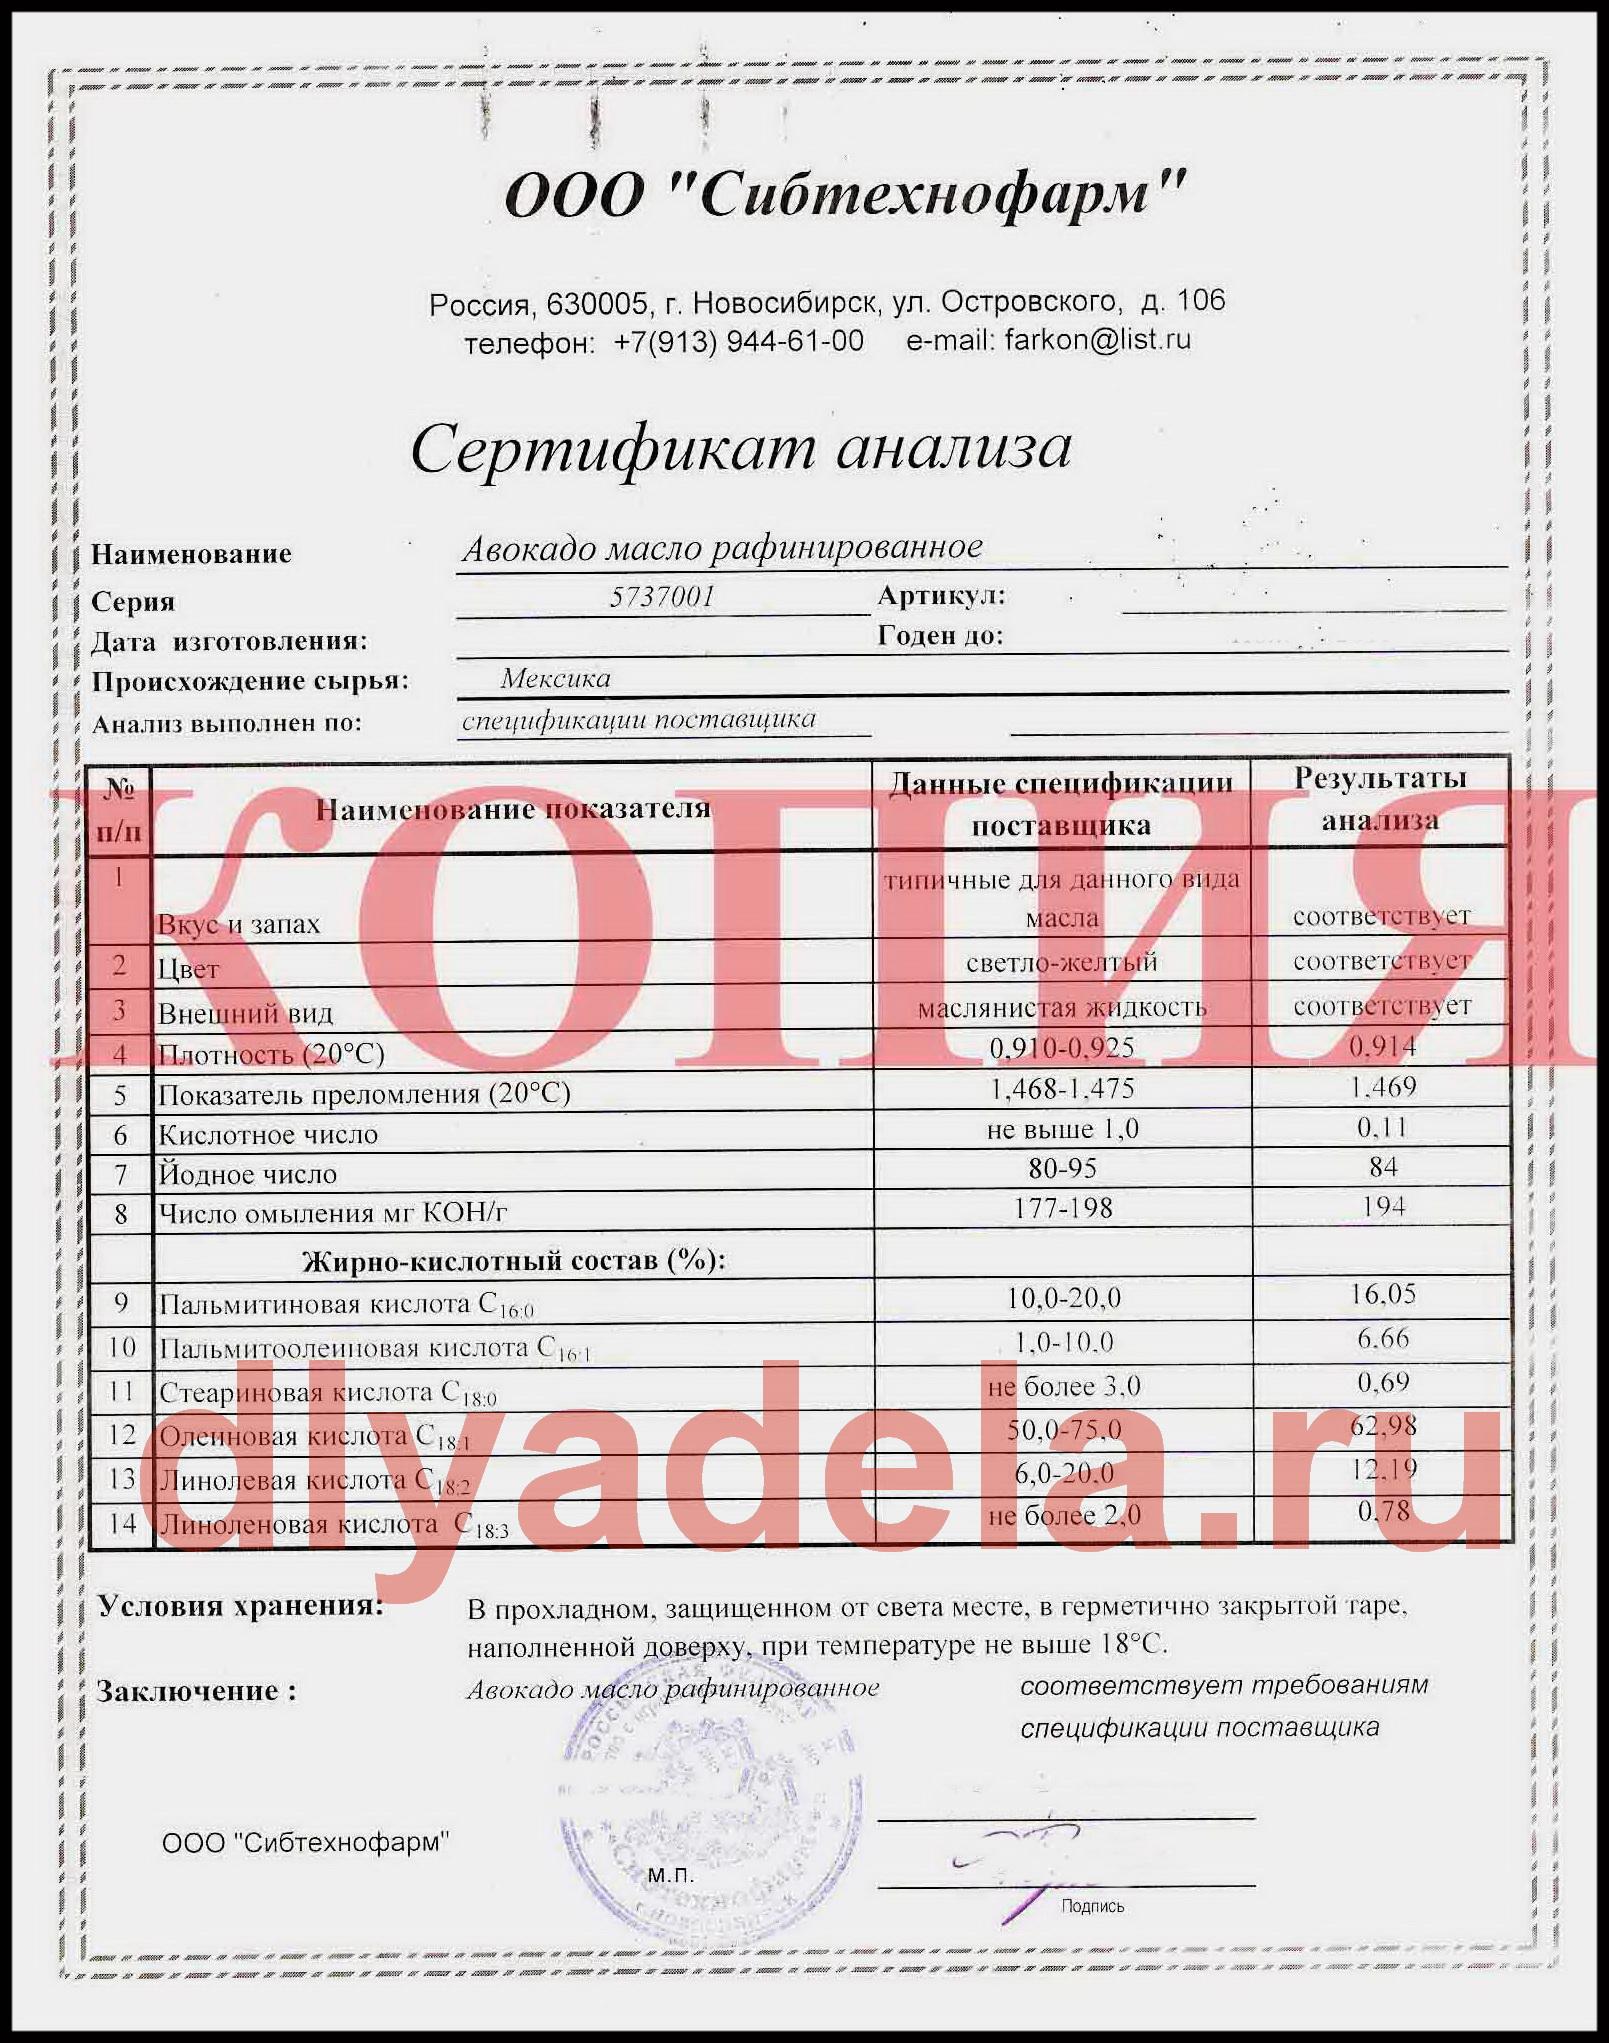 Сертификат_авокадо_масла.jpg